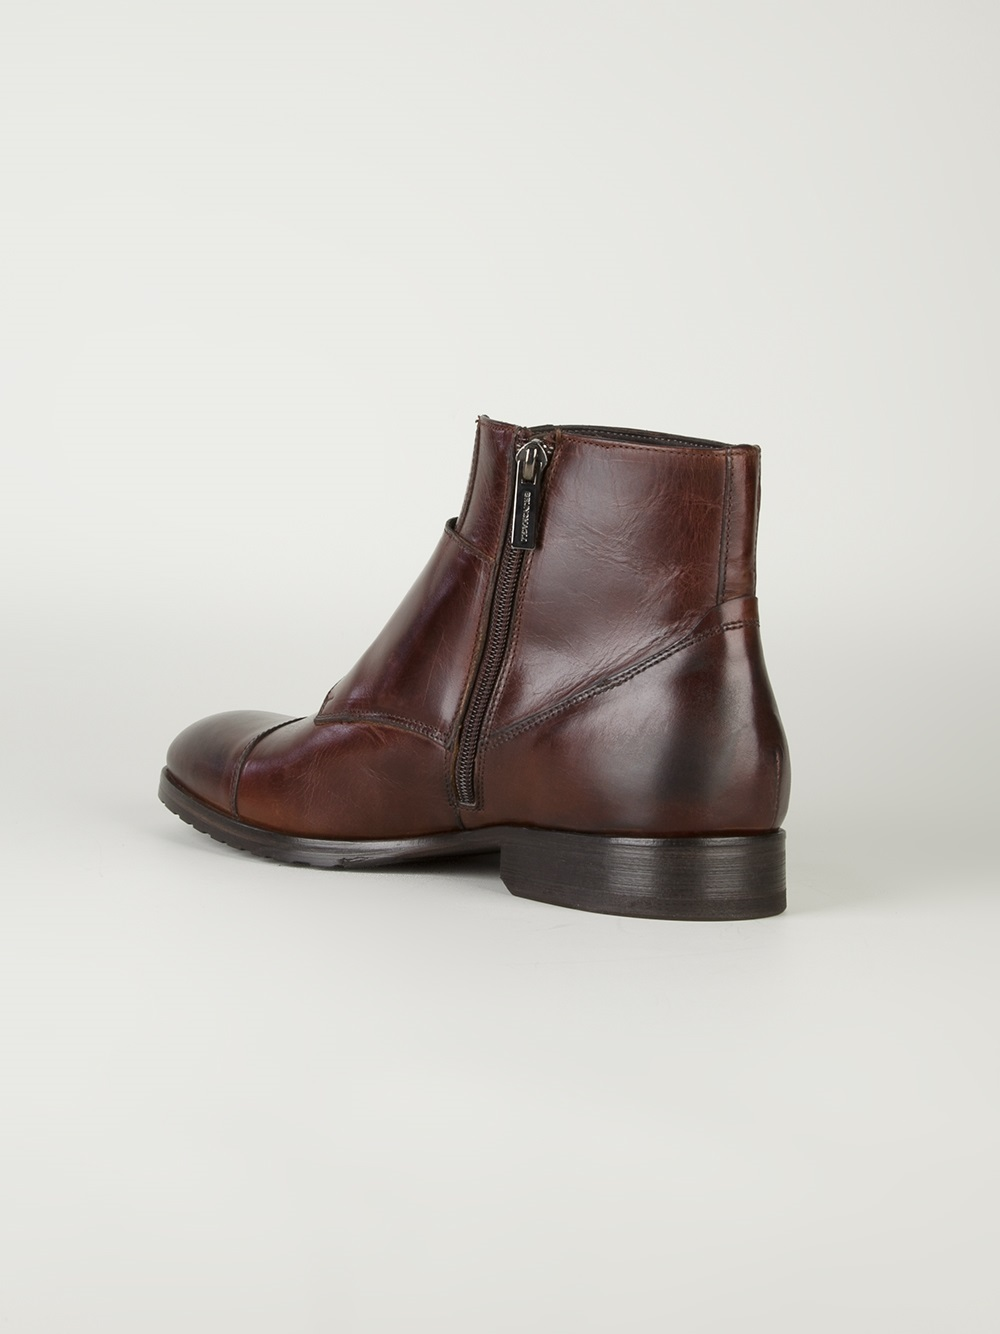 Lyst Bruno Magli Double Buckle Shoe In Brown For Men